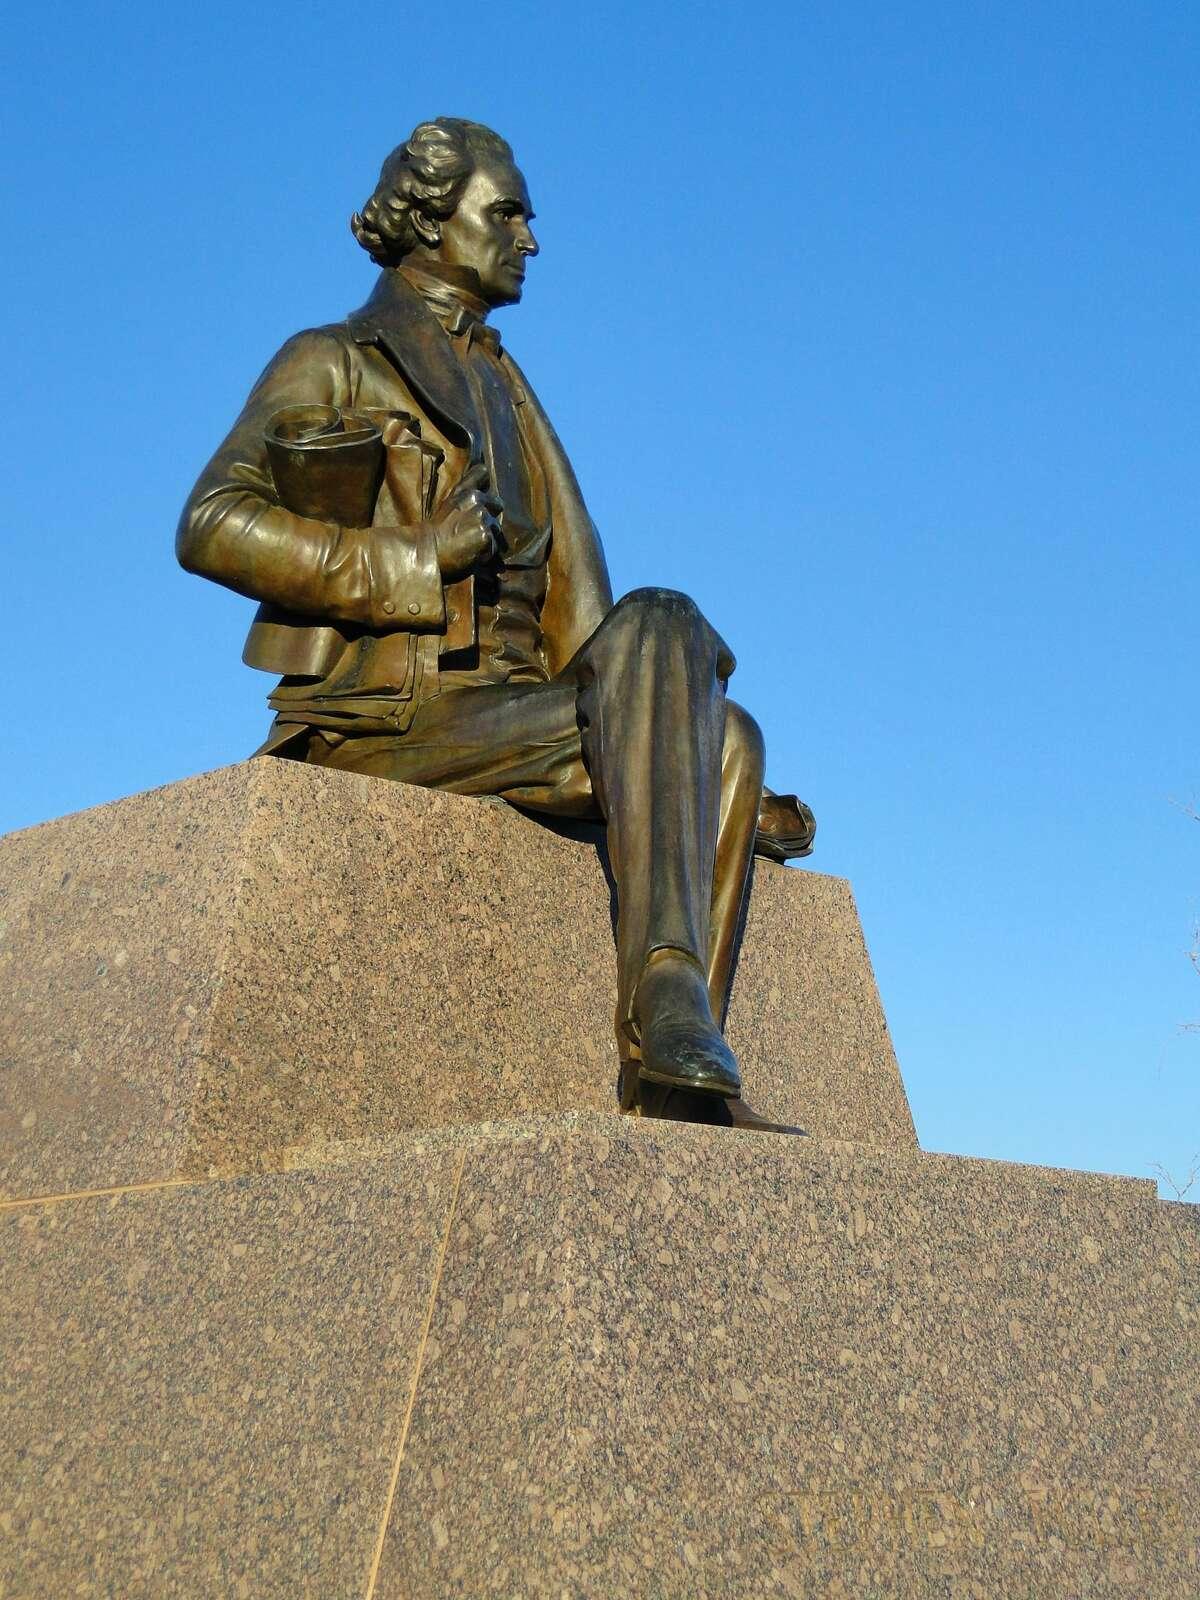 Statue of Stephen F. Austin